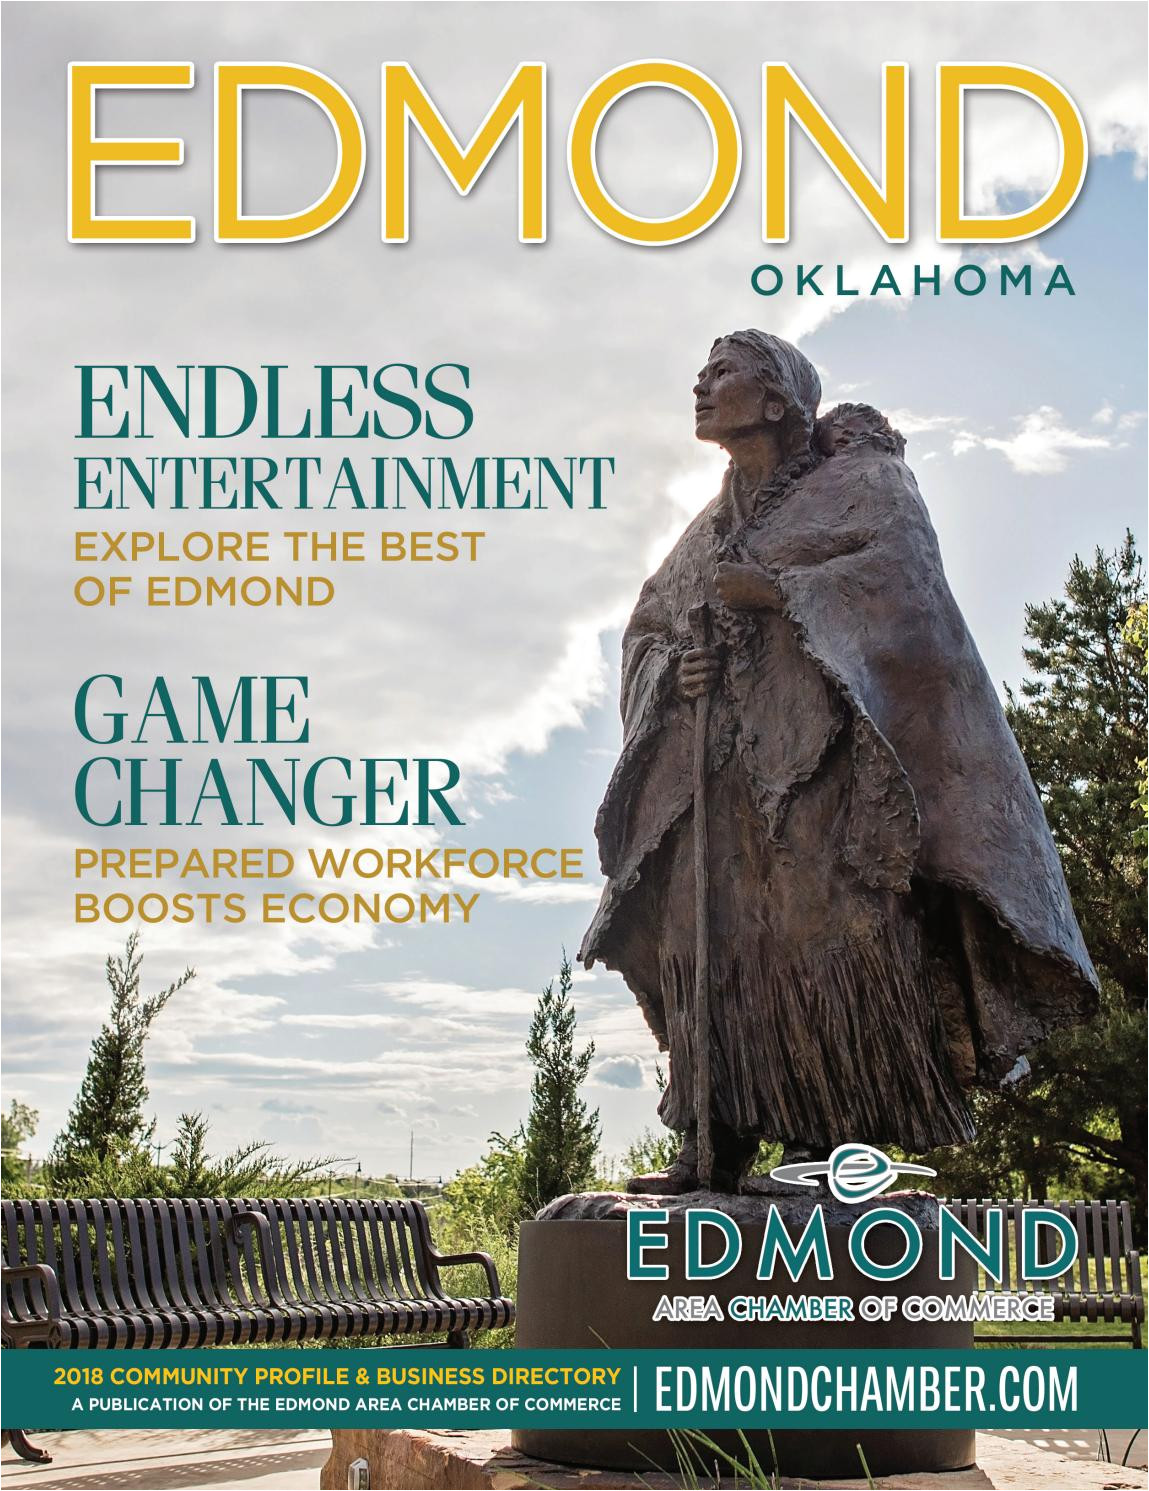 Public Storage Edmond Ok 73012 Edmond Ok Community Profile and Business Directory by town Square